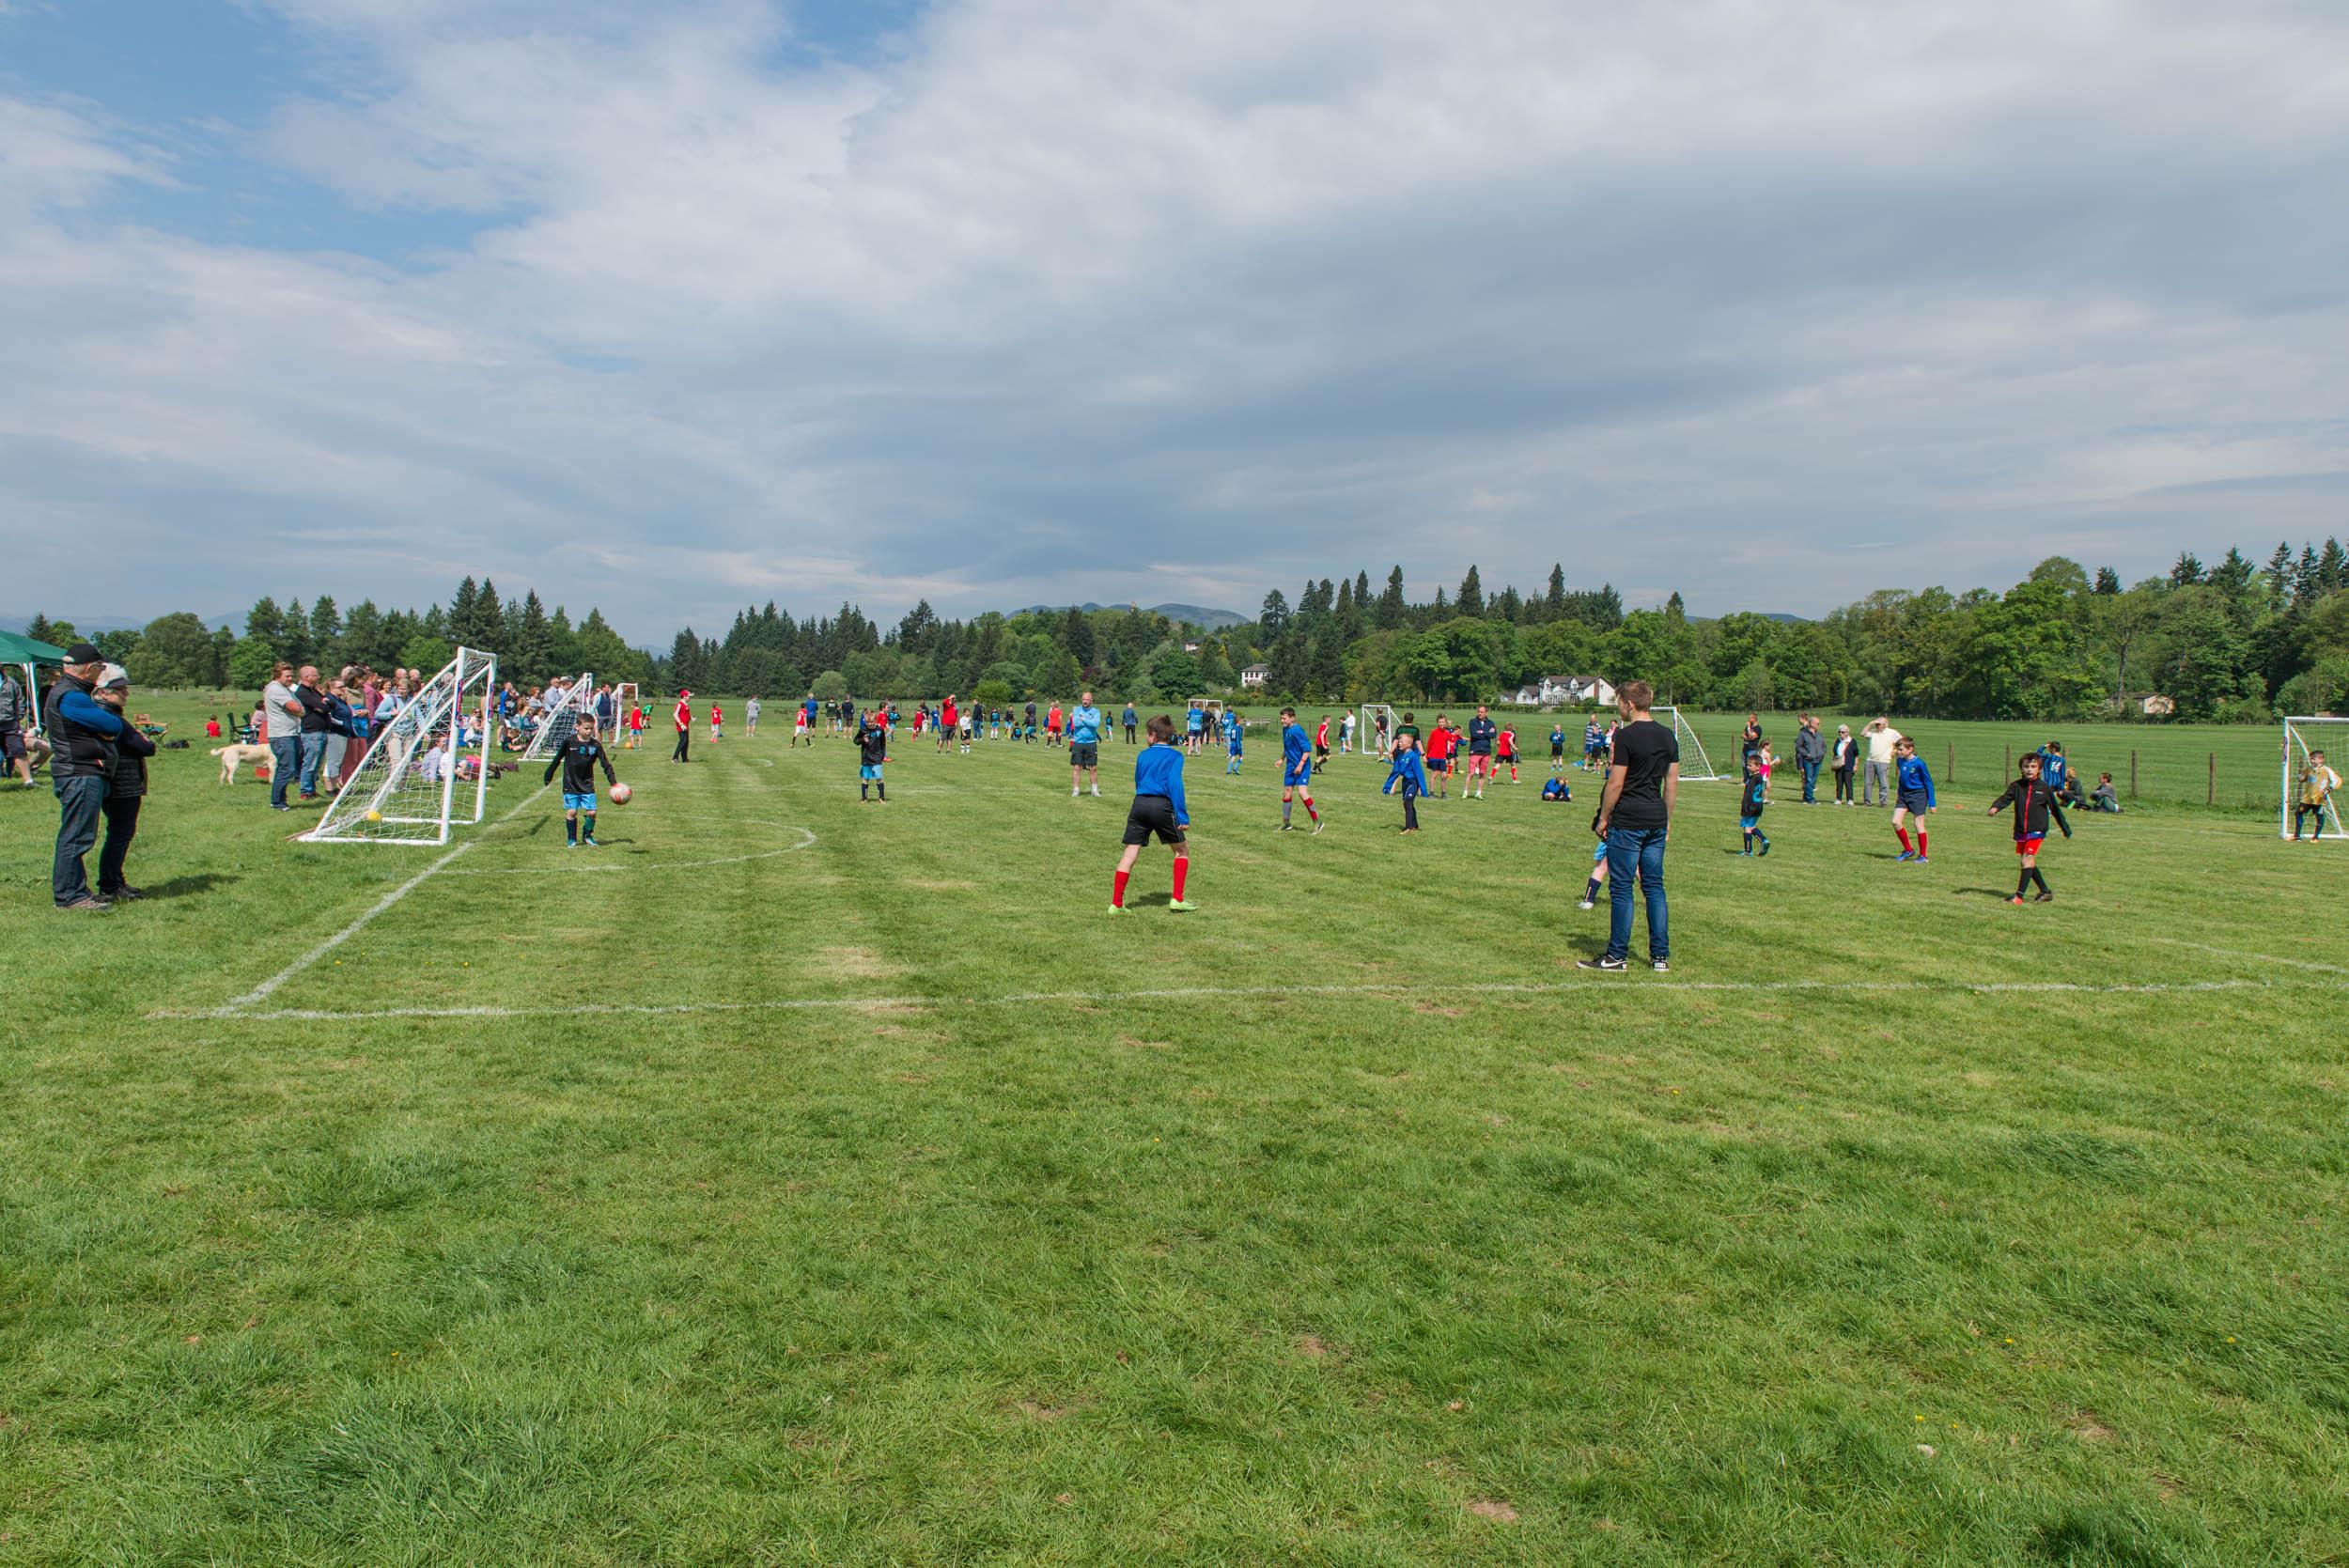 Drymen Show Football Tournament